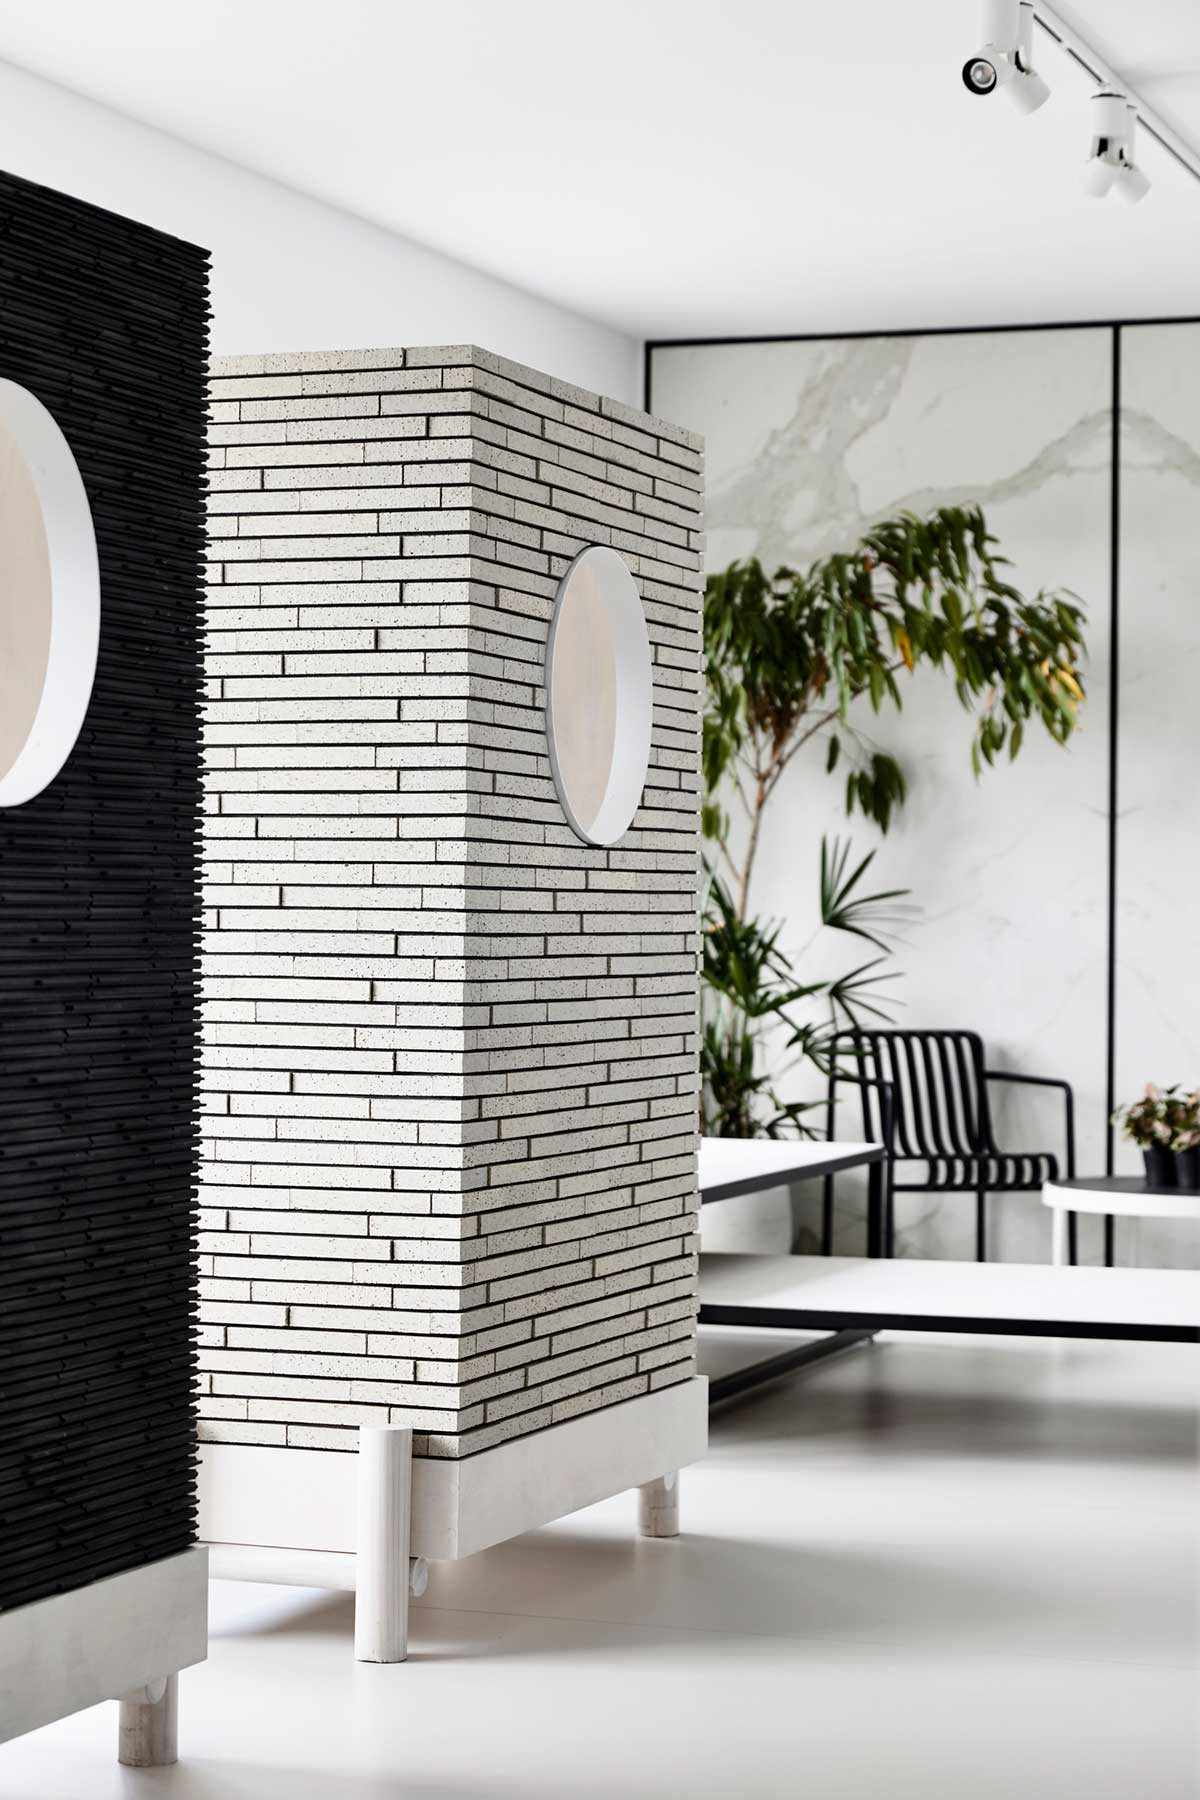 ©-Adam-Robinson-Design-Accent-Plants-14.jpg